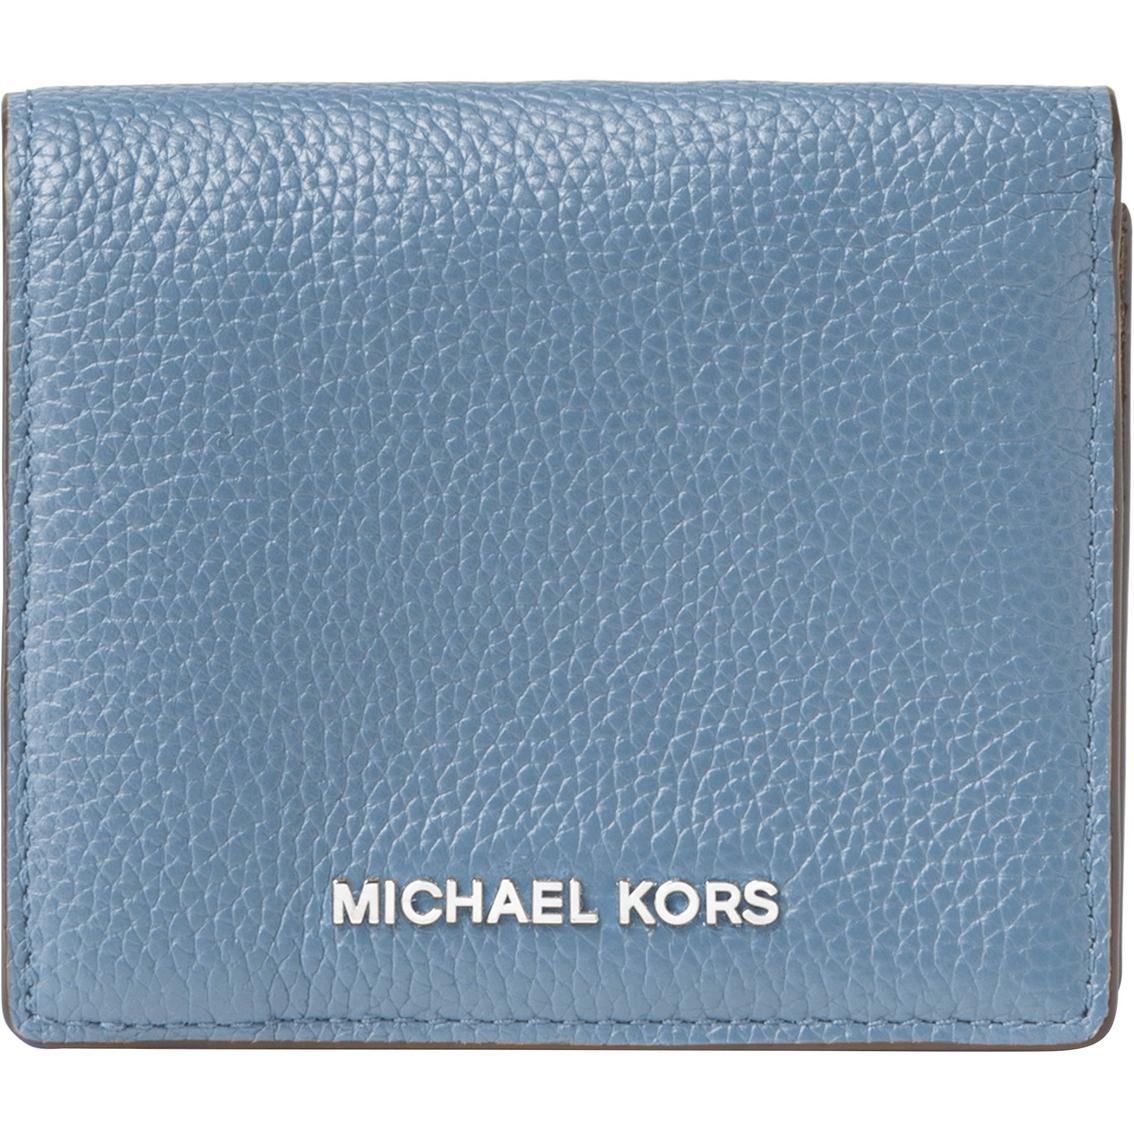 85c06f18a29f5 Michael Kors Mercer Carryall Card Case